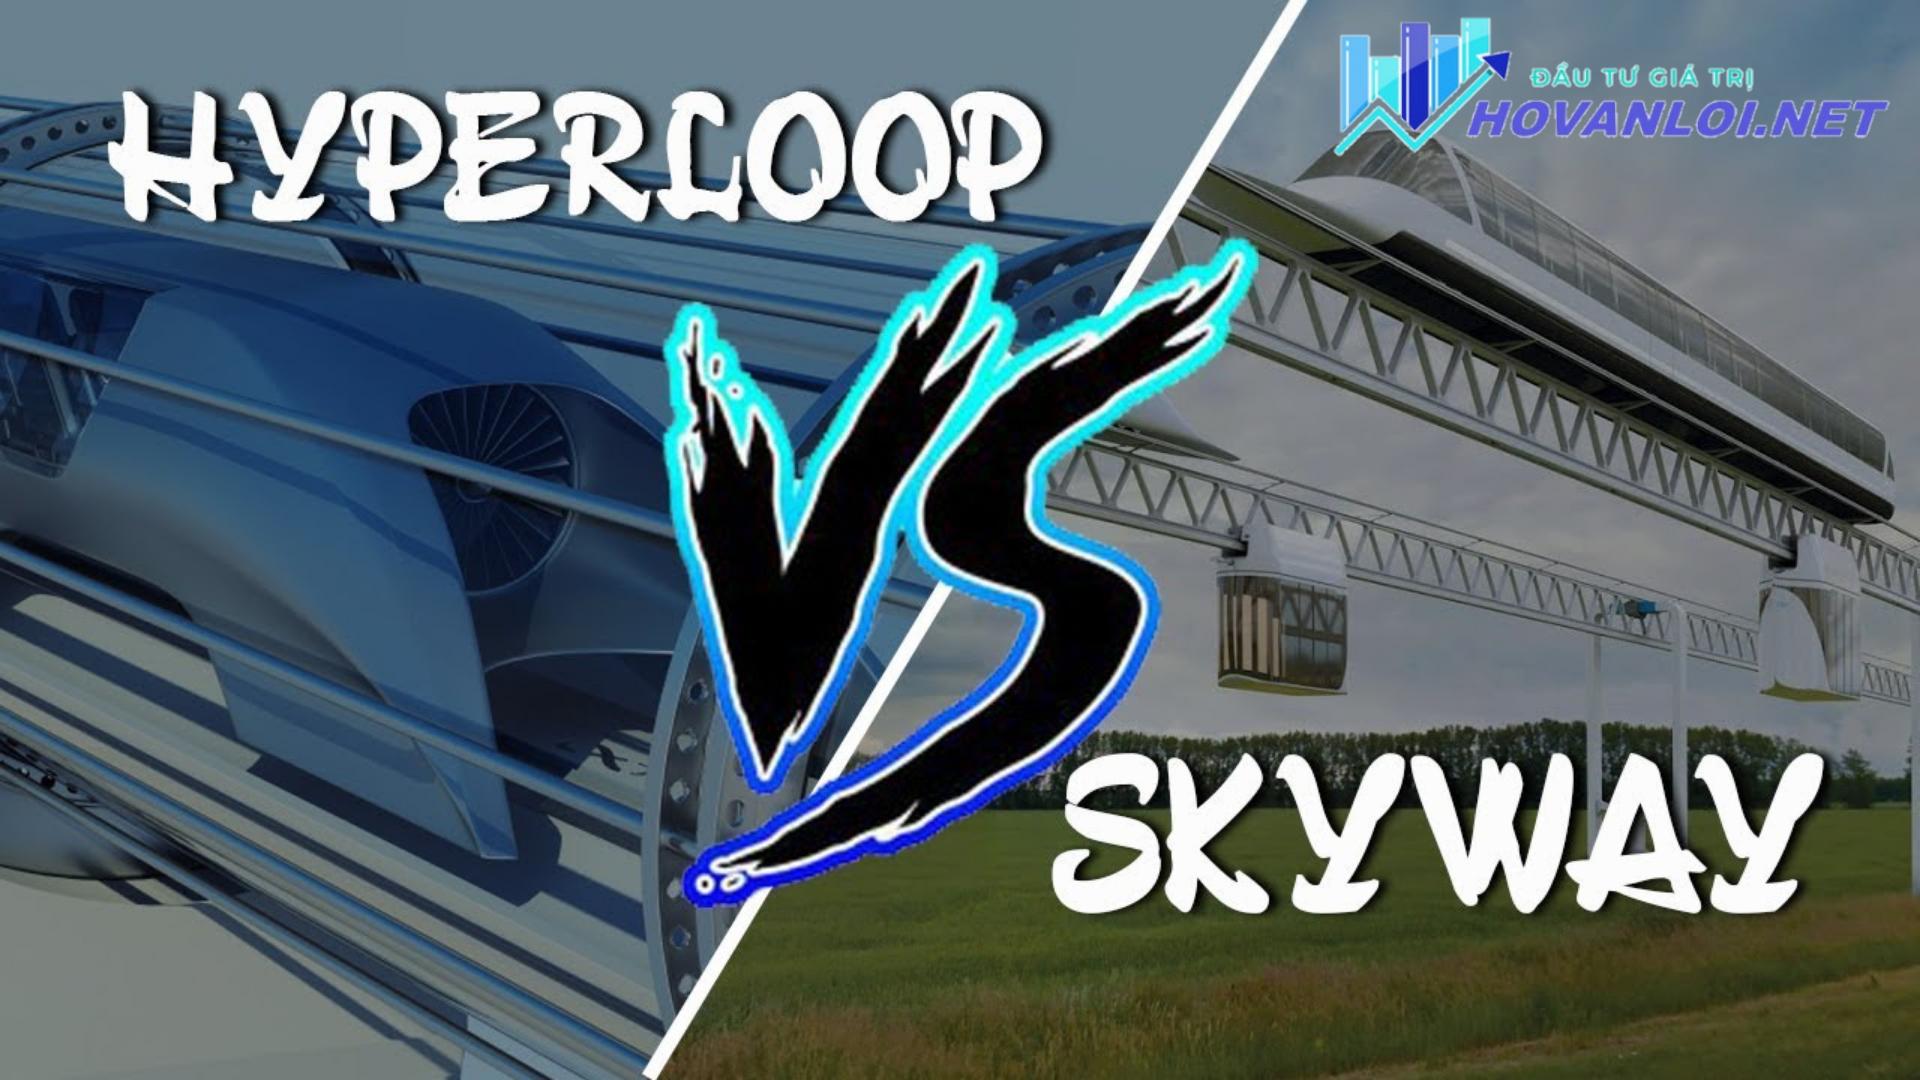 So sánh SkyWay vs Hyperloop